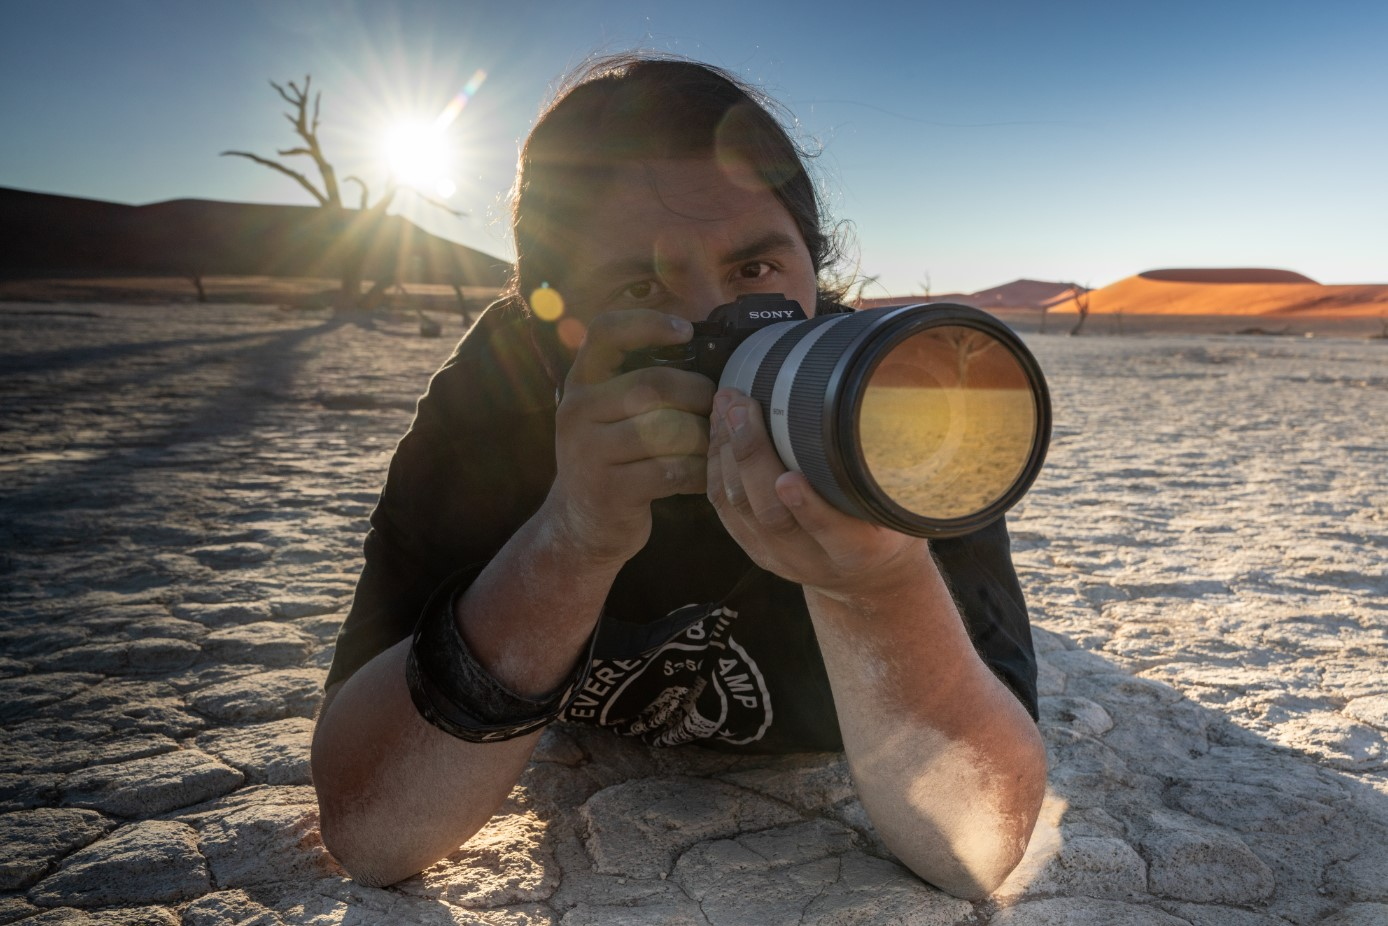 ¿Qué cámara me compro? por Esteban Toro